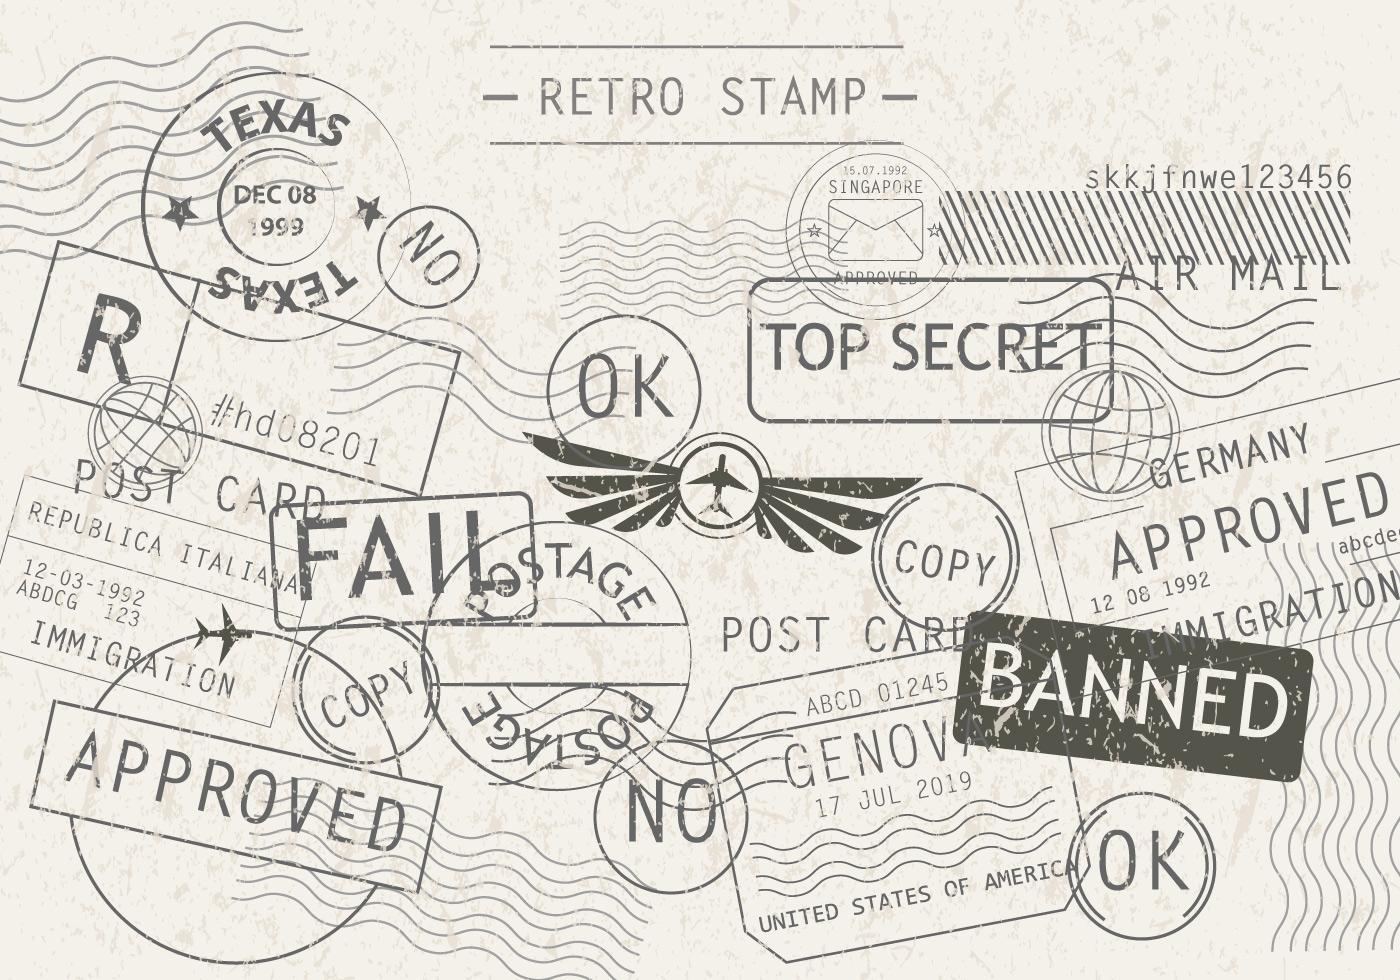 bd33f0442d88d Stamp Free Vector Art - (21576 Free Downloads)